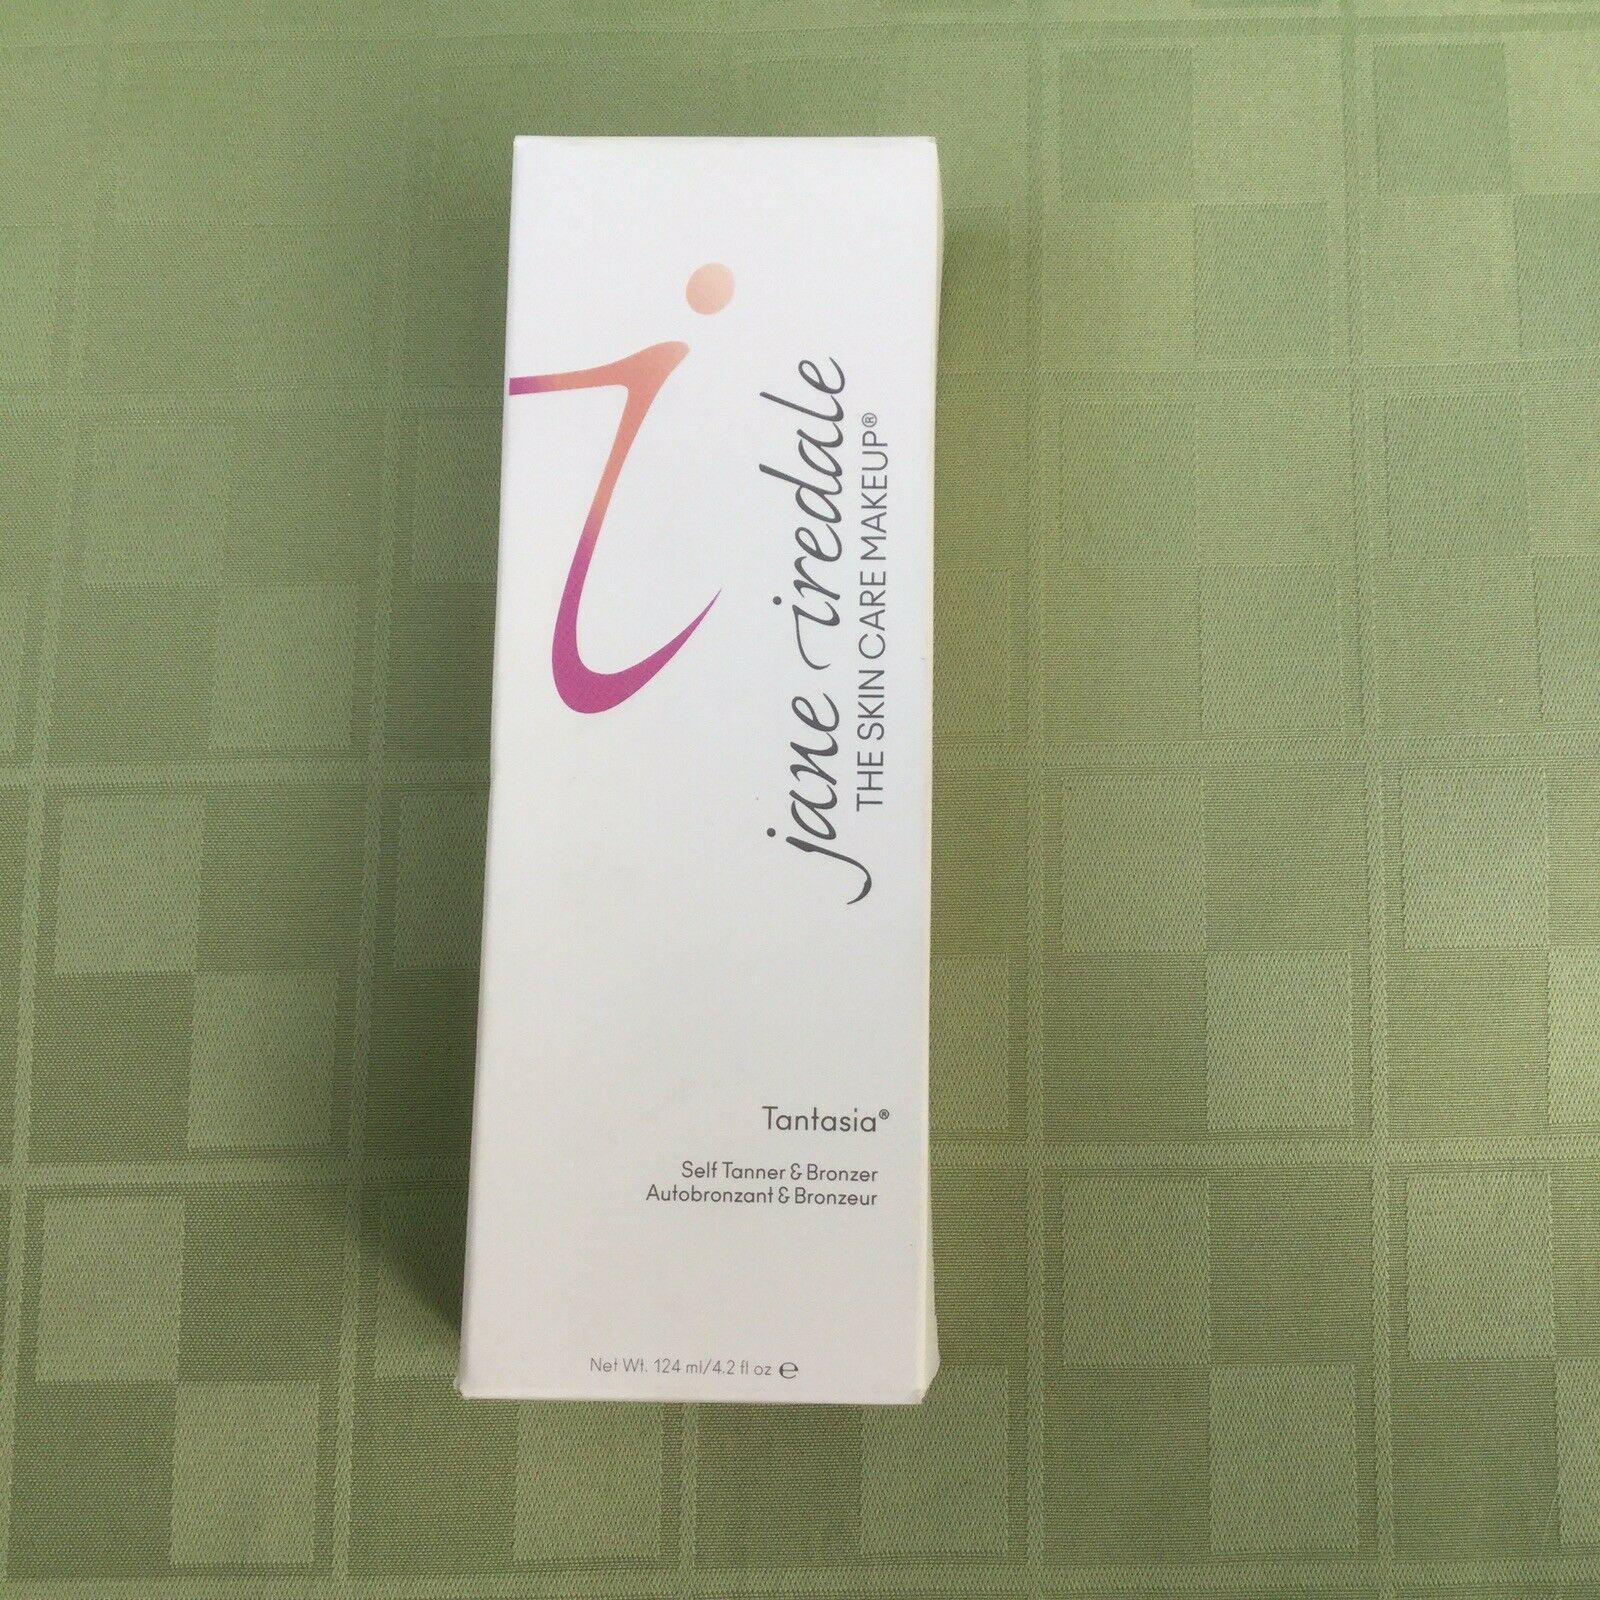 Jane Iredale Tantasia Self Tanner Bronzer 4.2 fl oz New - $28.04